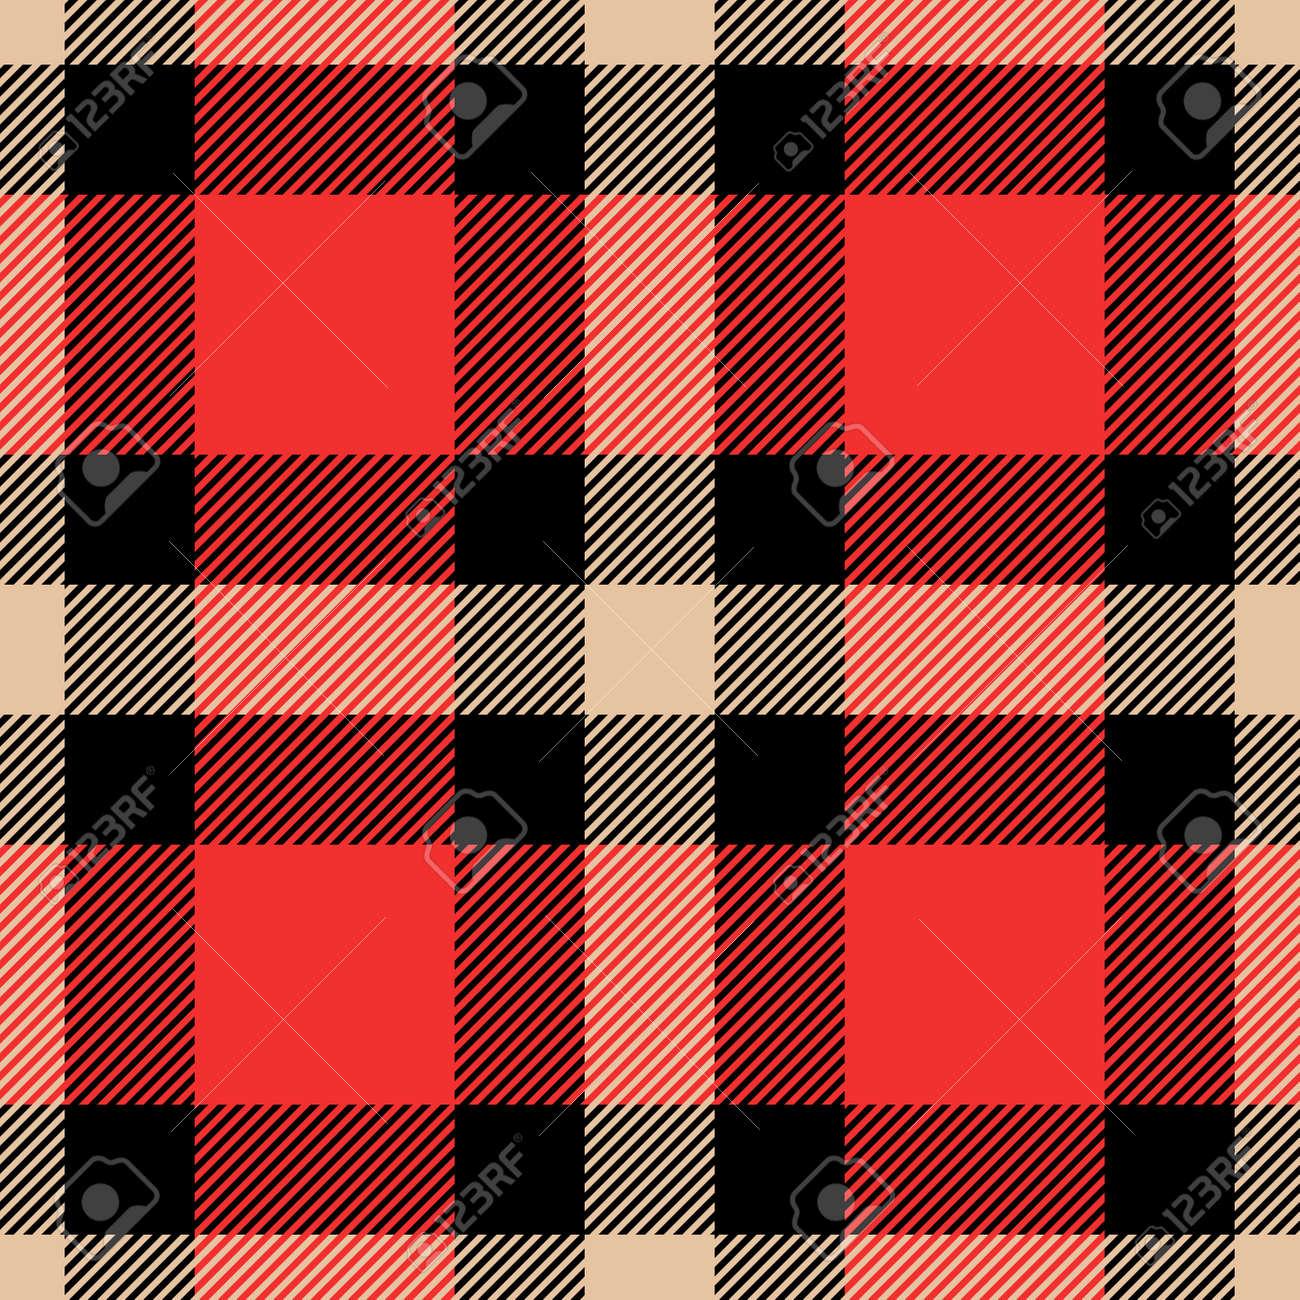 Classic tartan and buffalo check plaid seamless patterns. Vector eps 10 - 112883009